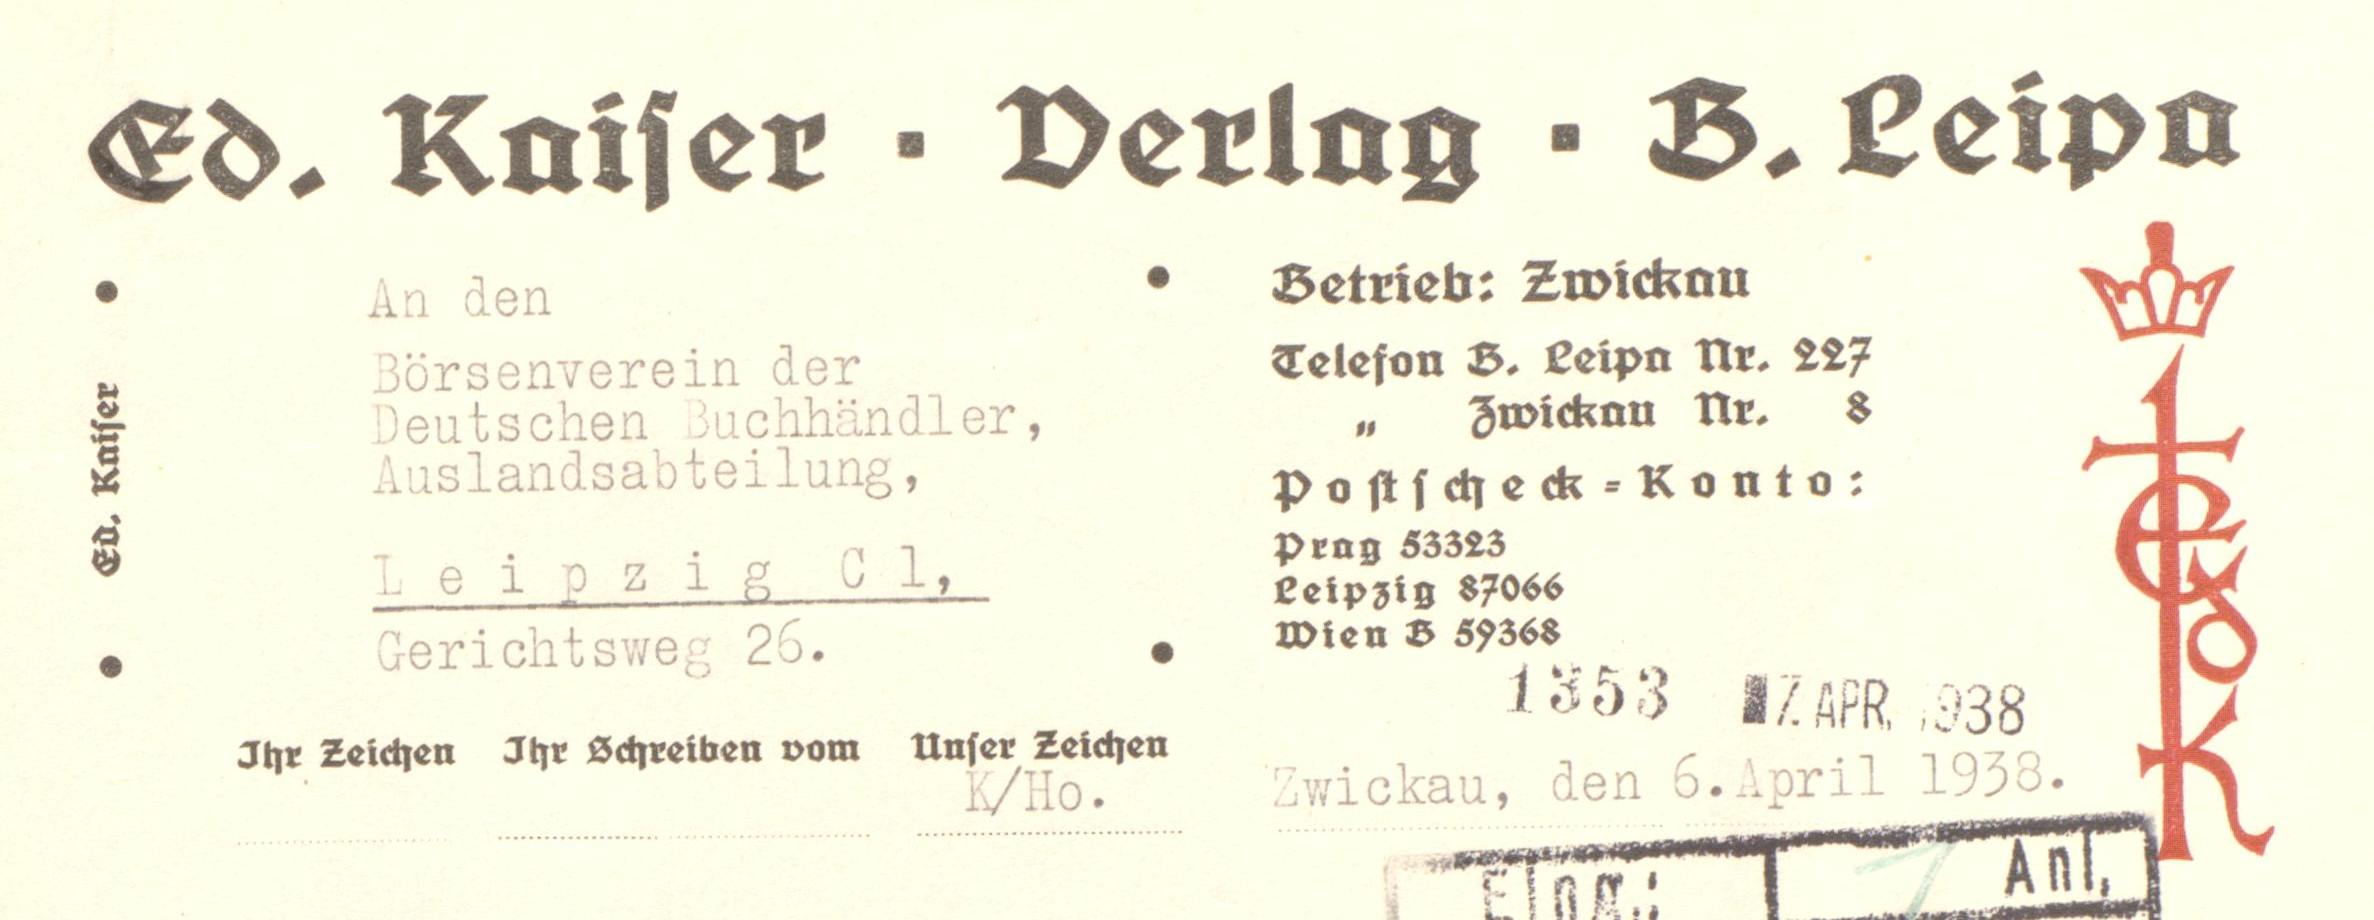 Eduard Kaiser Verlag Briefkopf 1